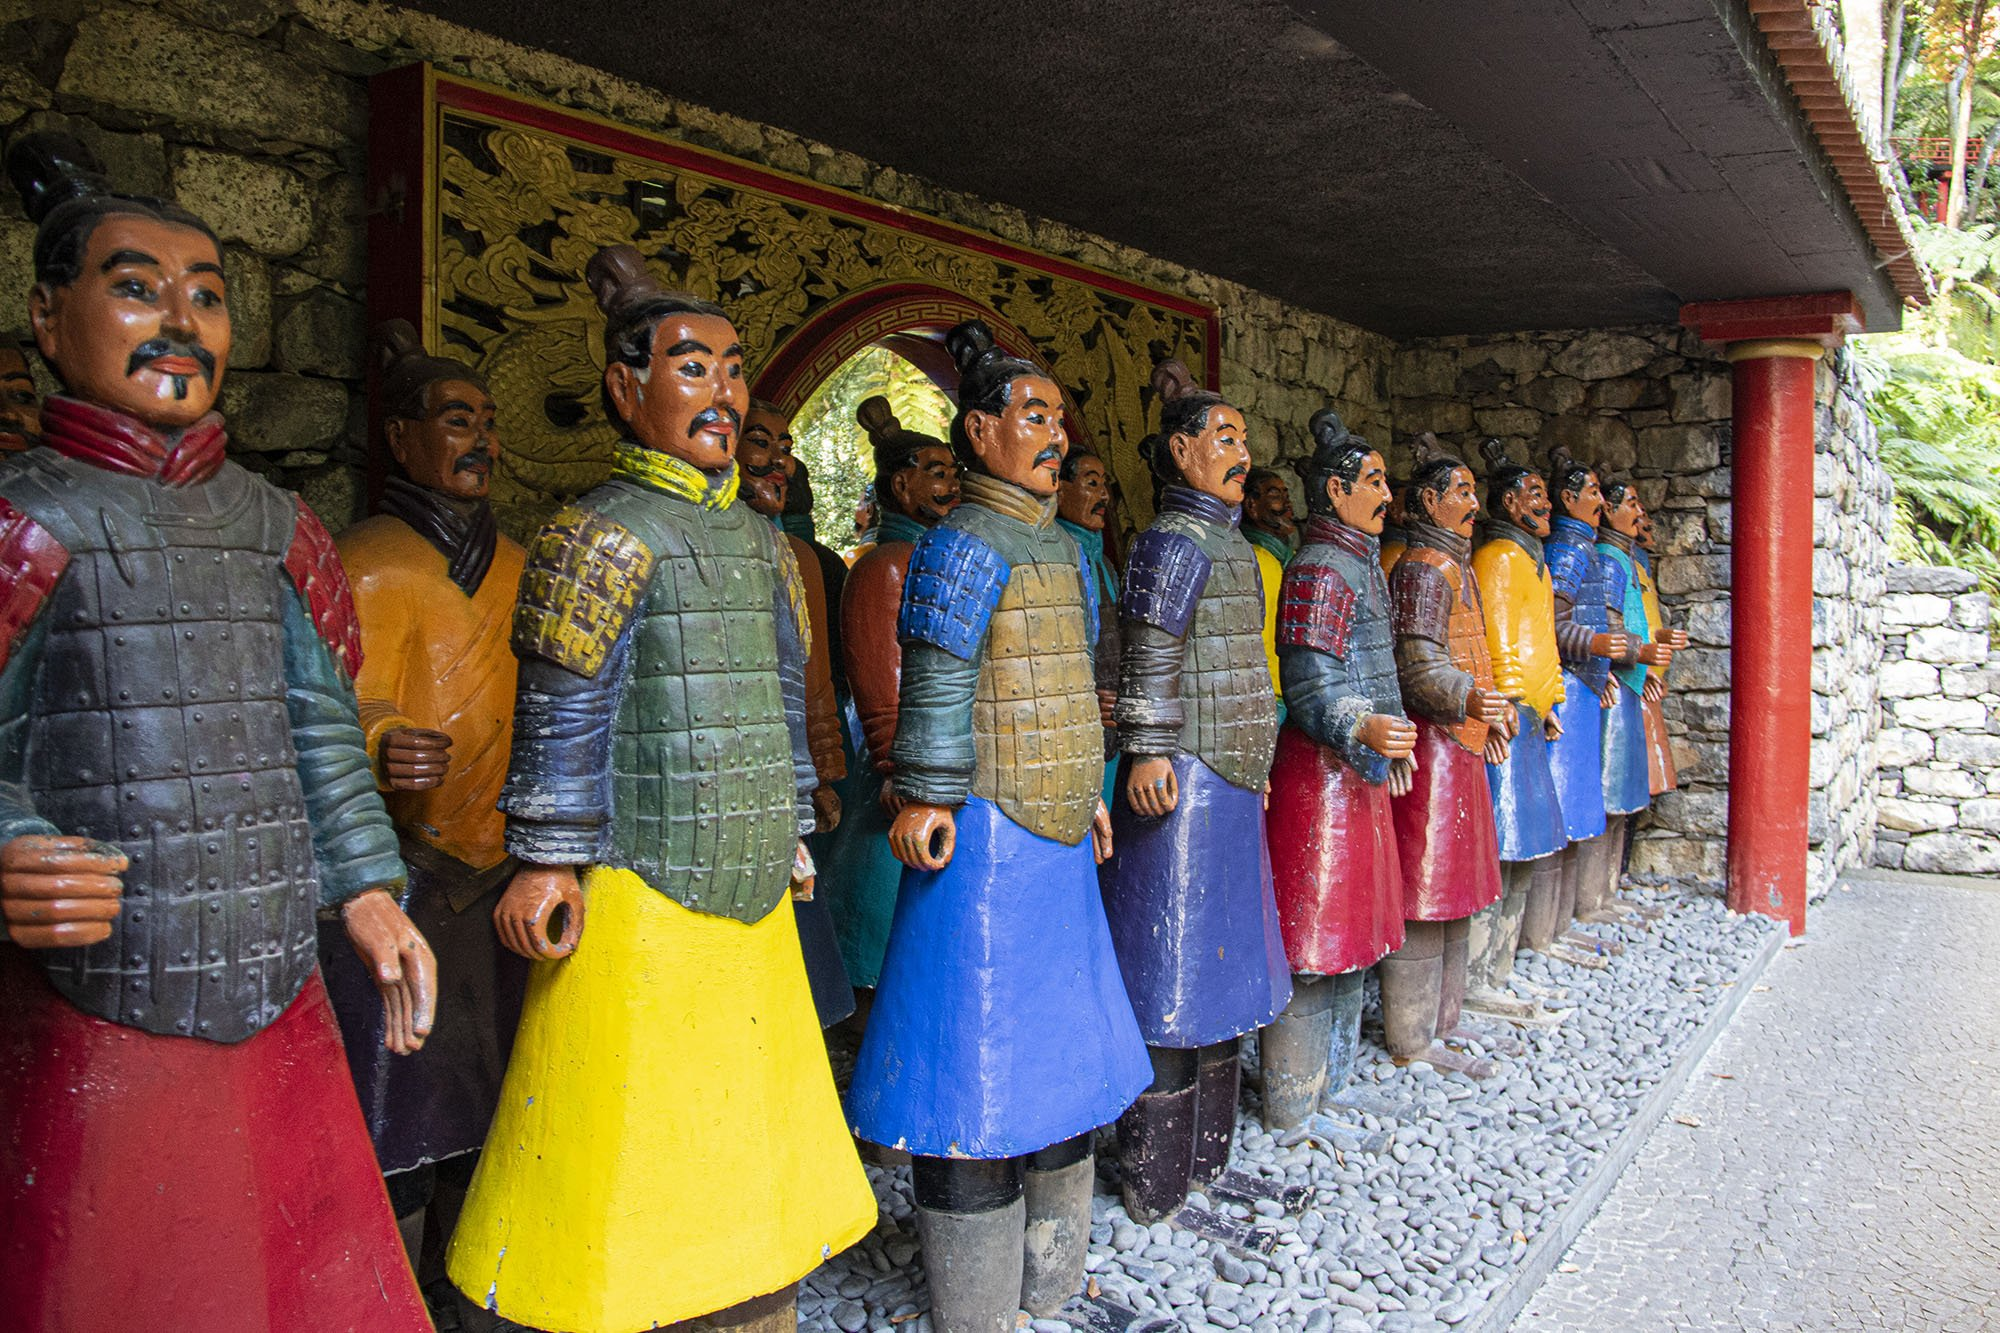 Colorfull Warriors